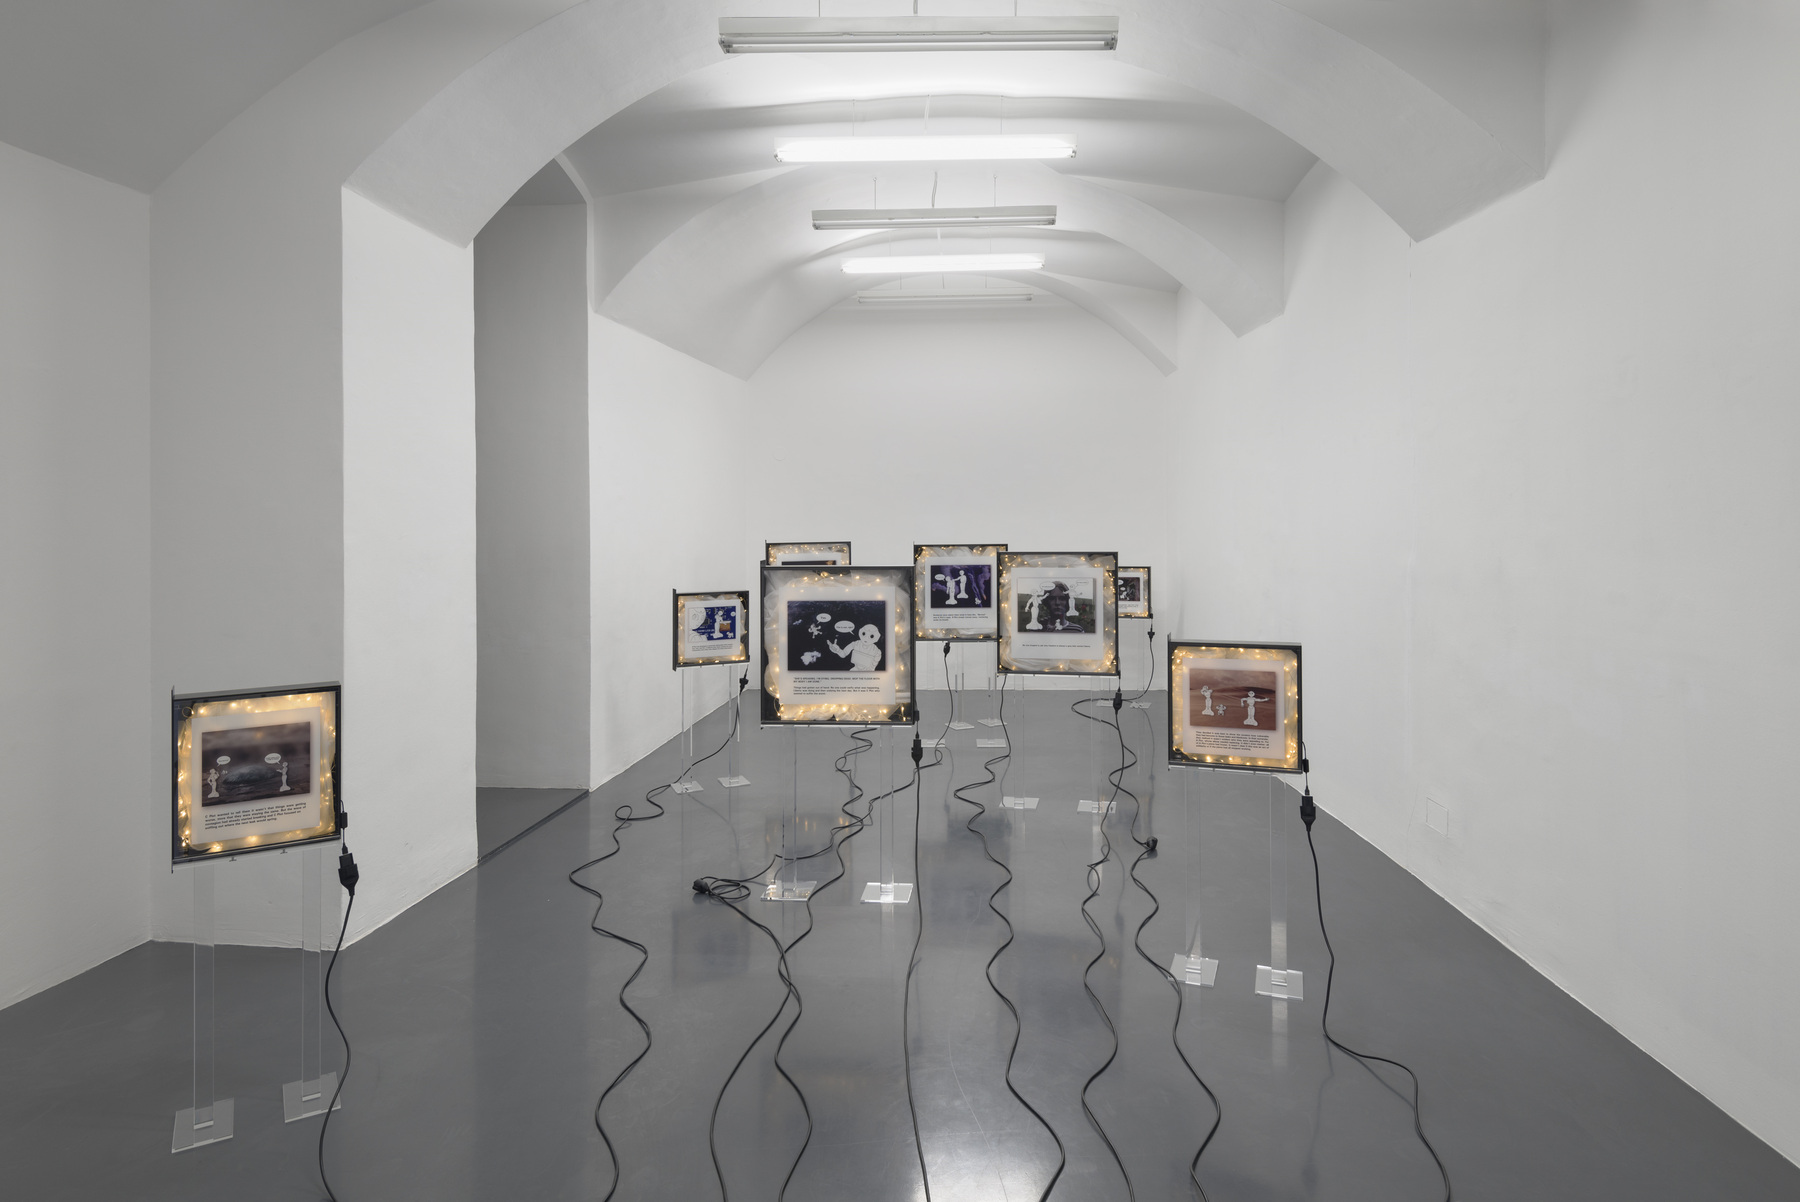 05_Cécile B. Evans_Galerie Emanuel Layr Vienna